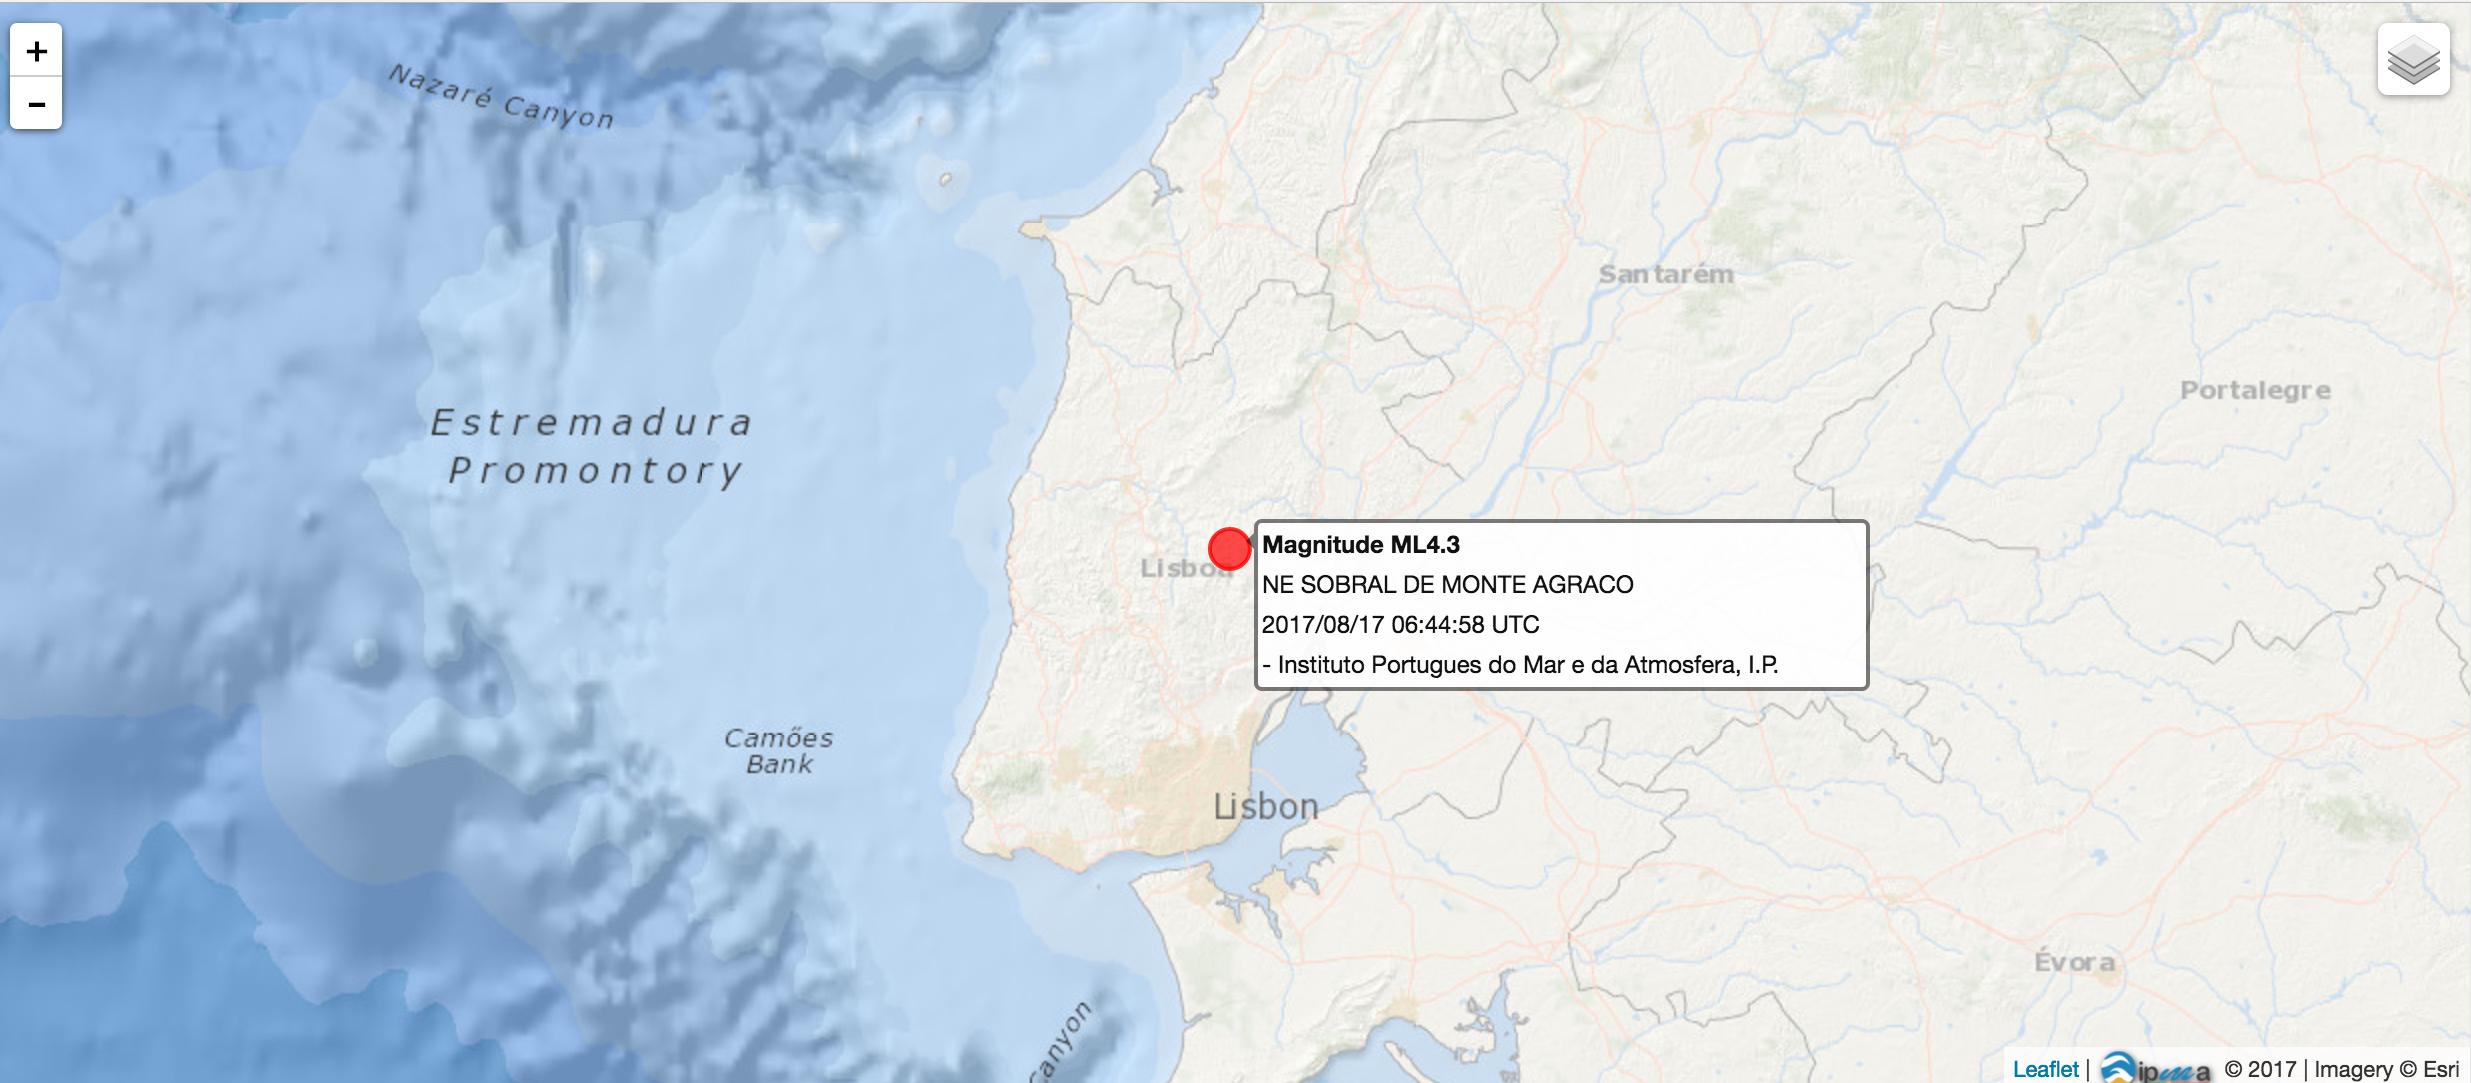 Lisboa abanou? Sim, foi um sismo de 4,3 na escala de Richter